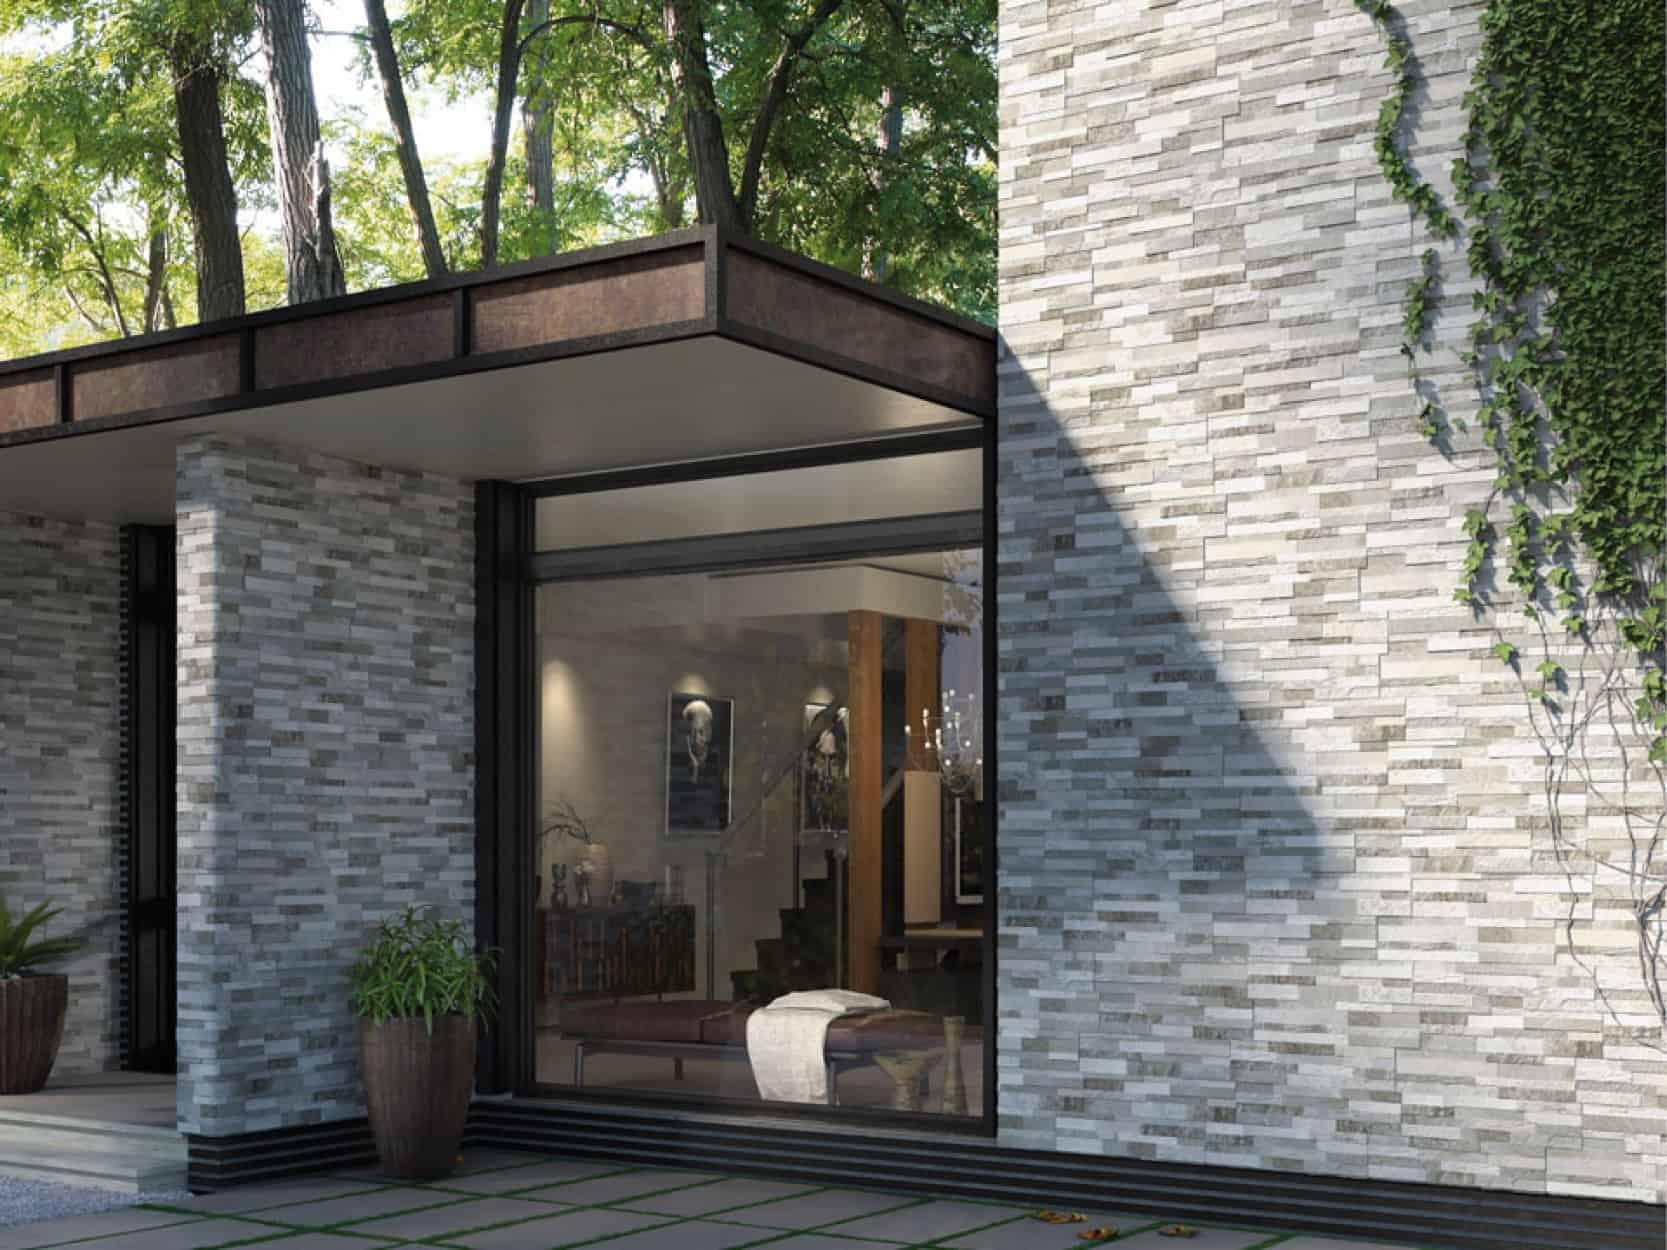 cubics 3d wall tiles split face porcelain emc tiles outdoor indoor walls